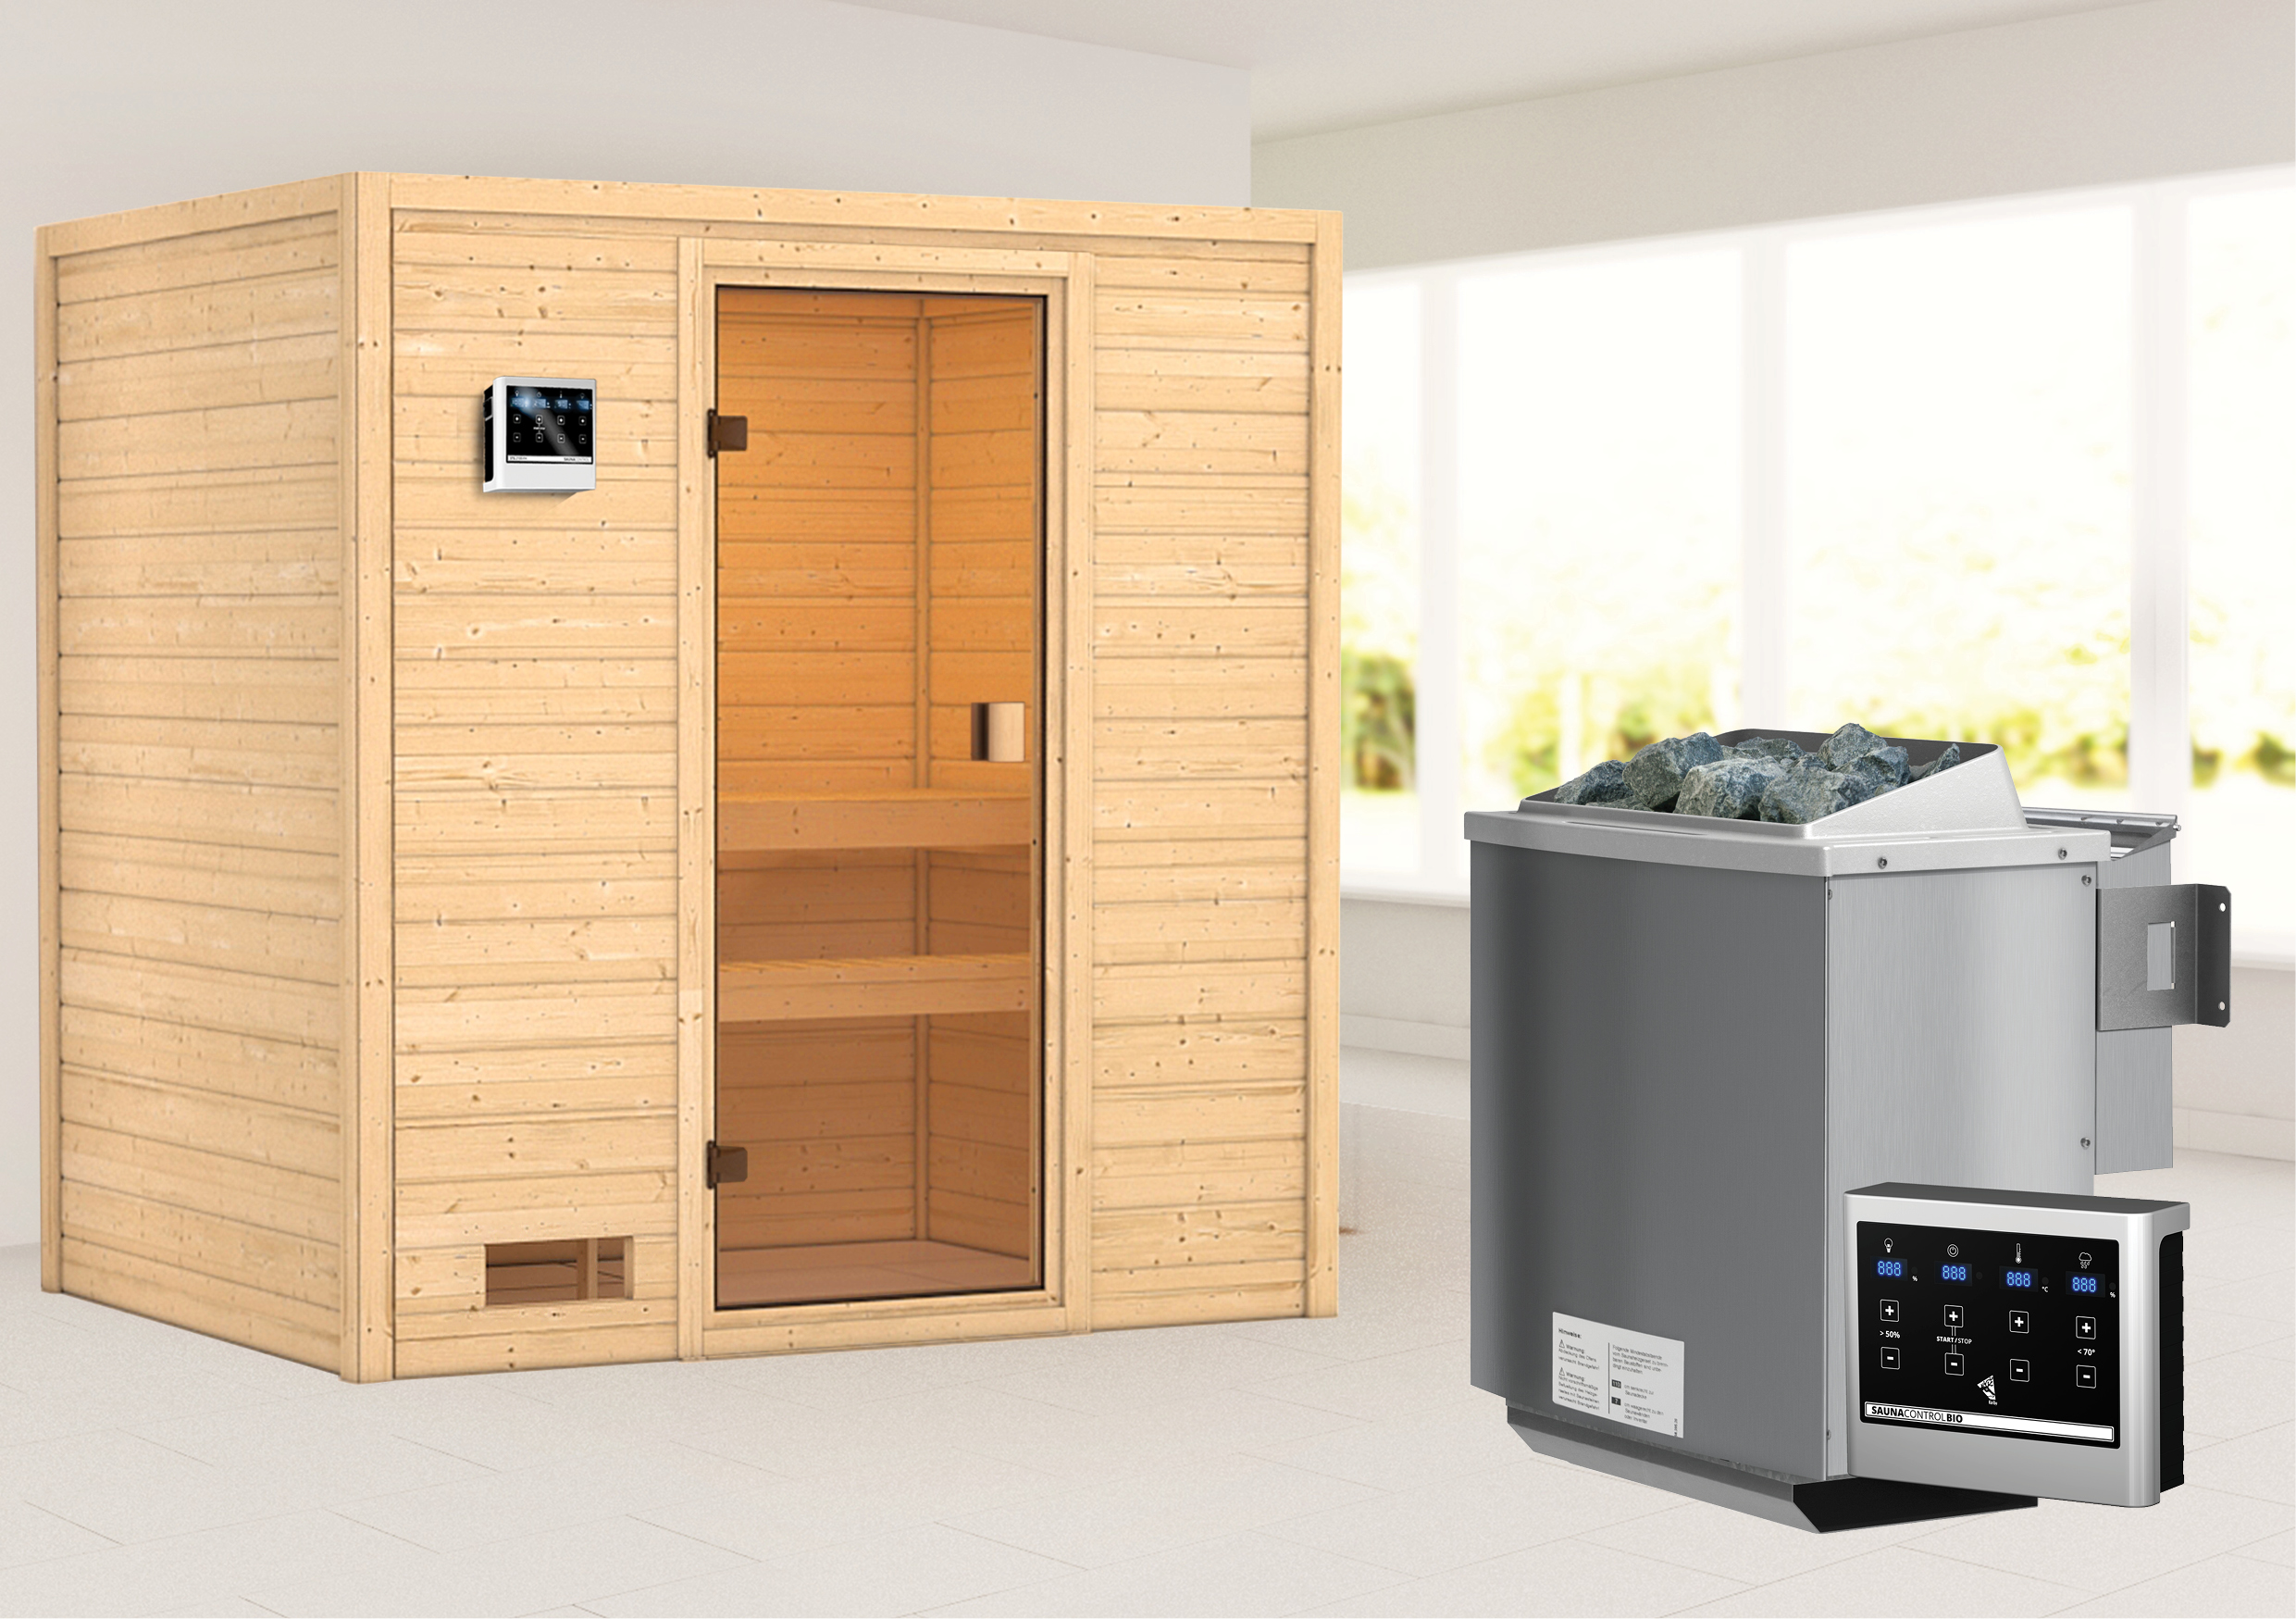 Woodfeeling Sauna Selena 38mm Bio Saunaofen 9 kW extern Bild 1